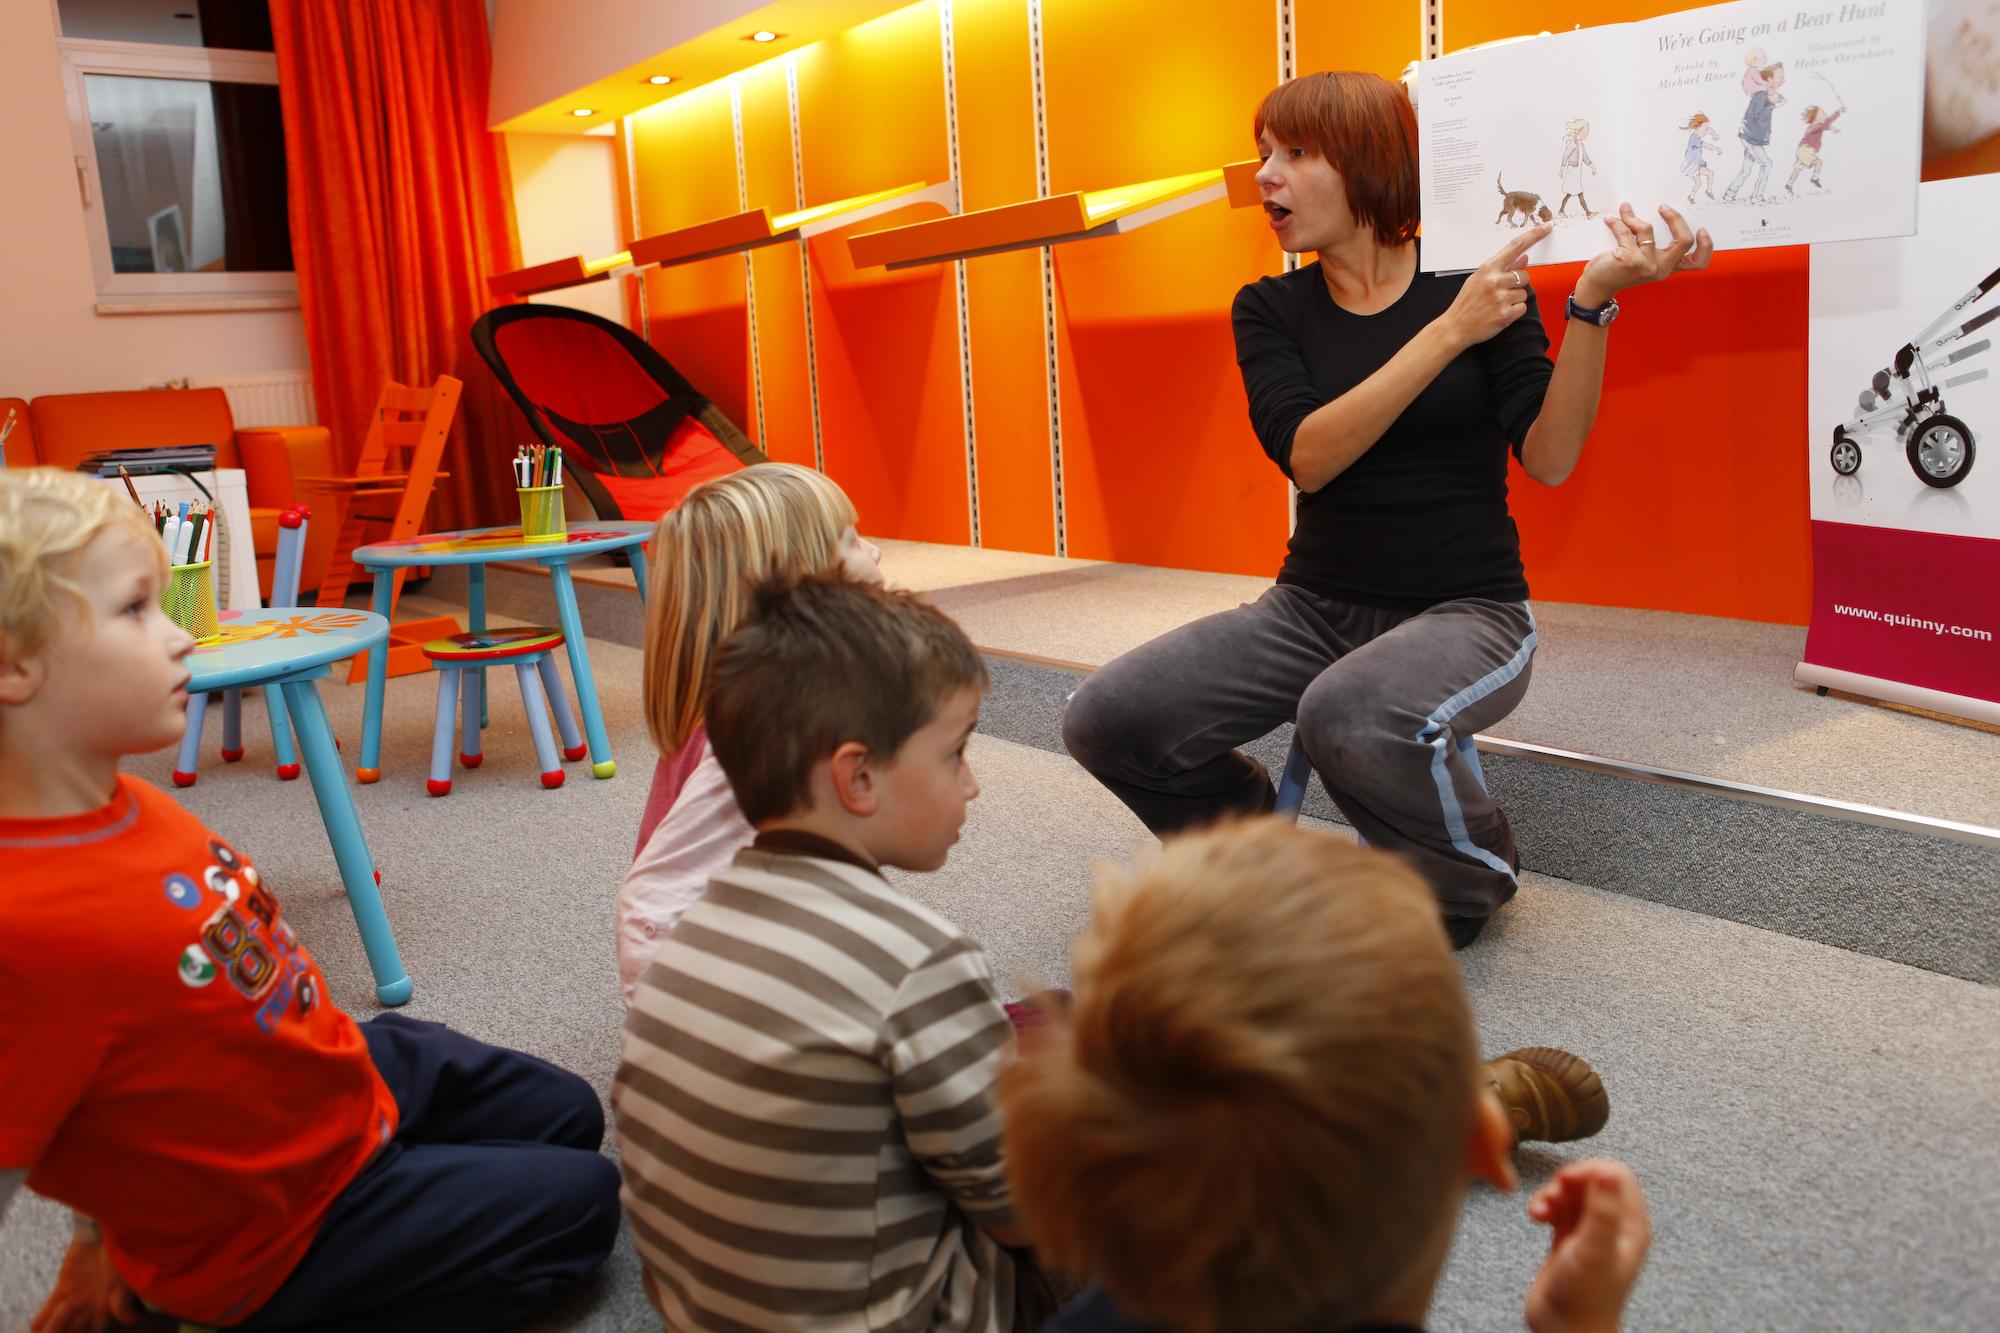 Pravljične urice v jezikovnem centru Lingula